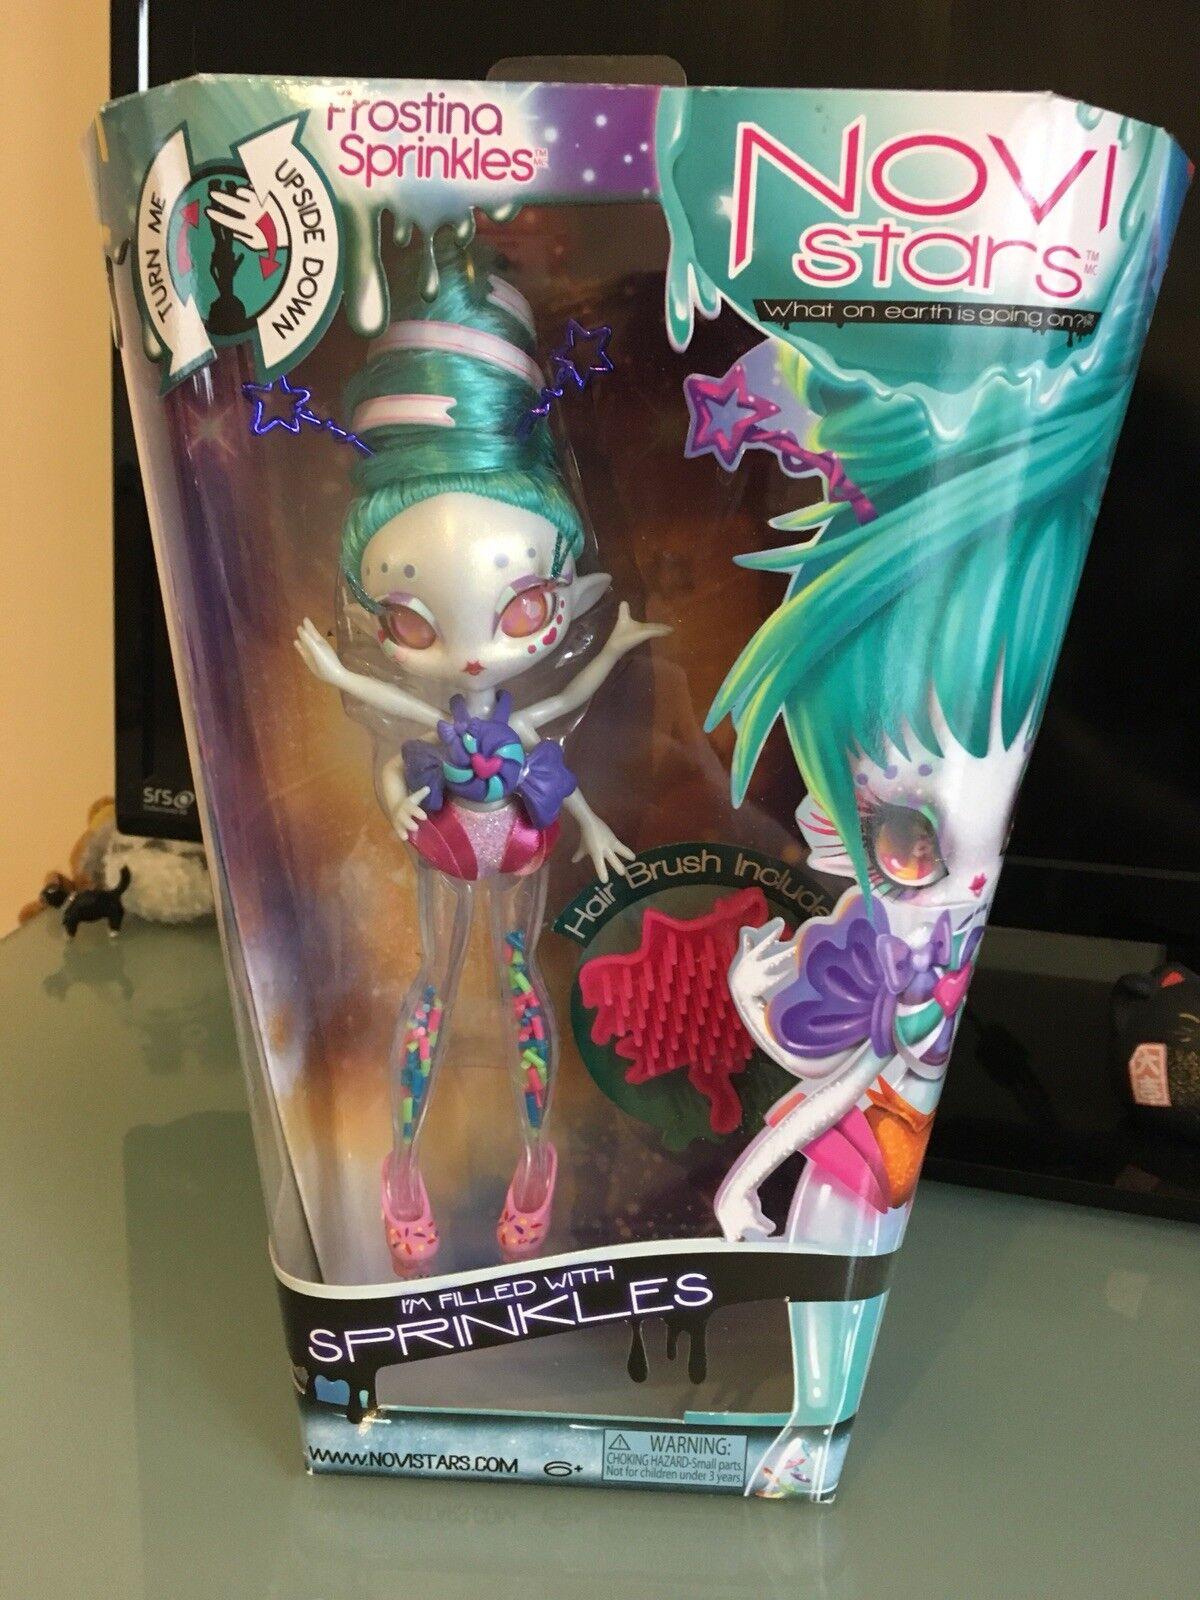 Novi Novi Novi Stars Frostina Sprinkles Rare Doll Bnib Nrfb Boxed Glitter 8f6b78